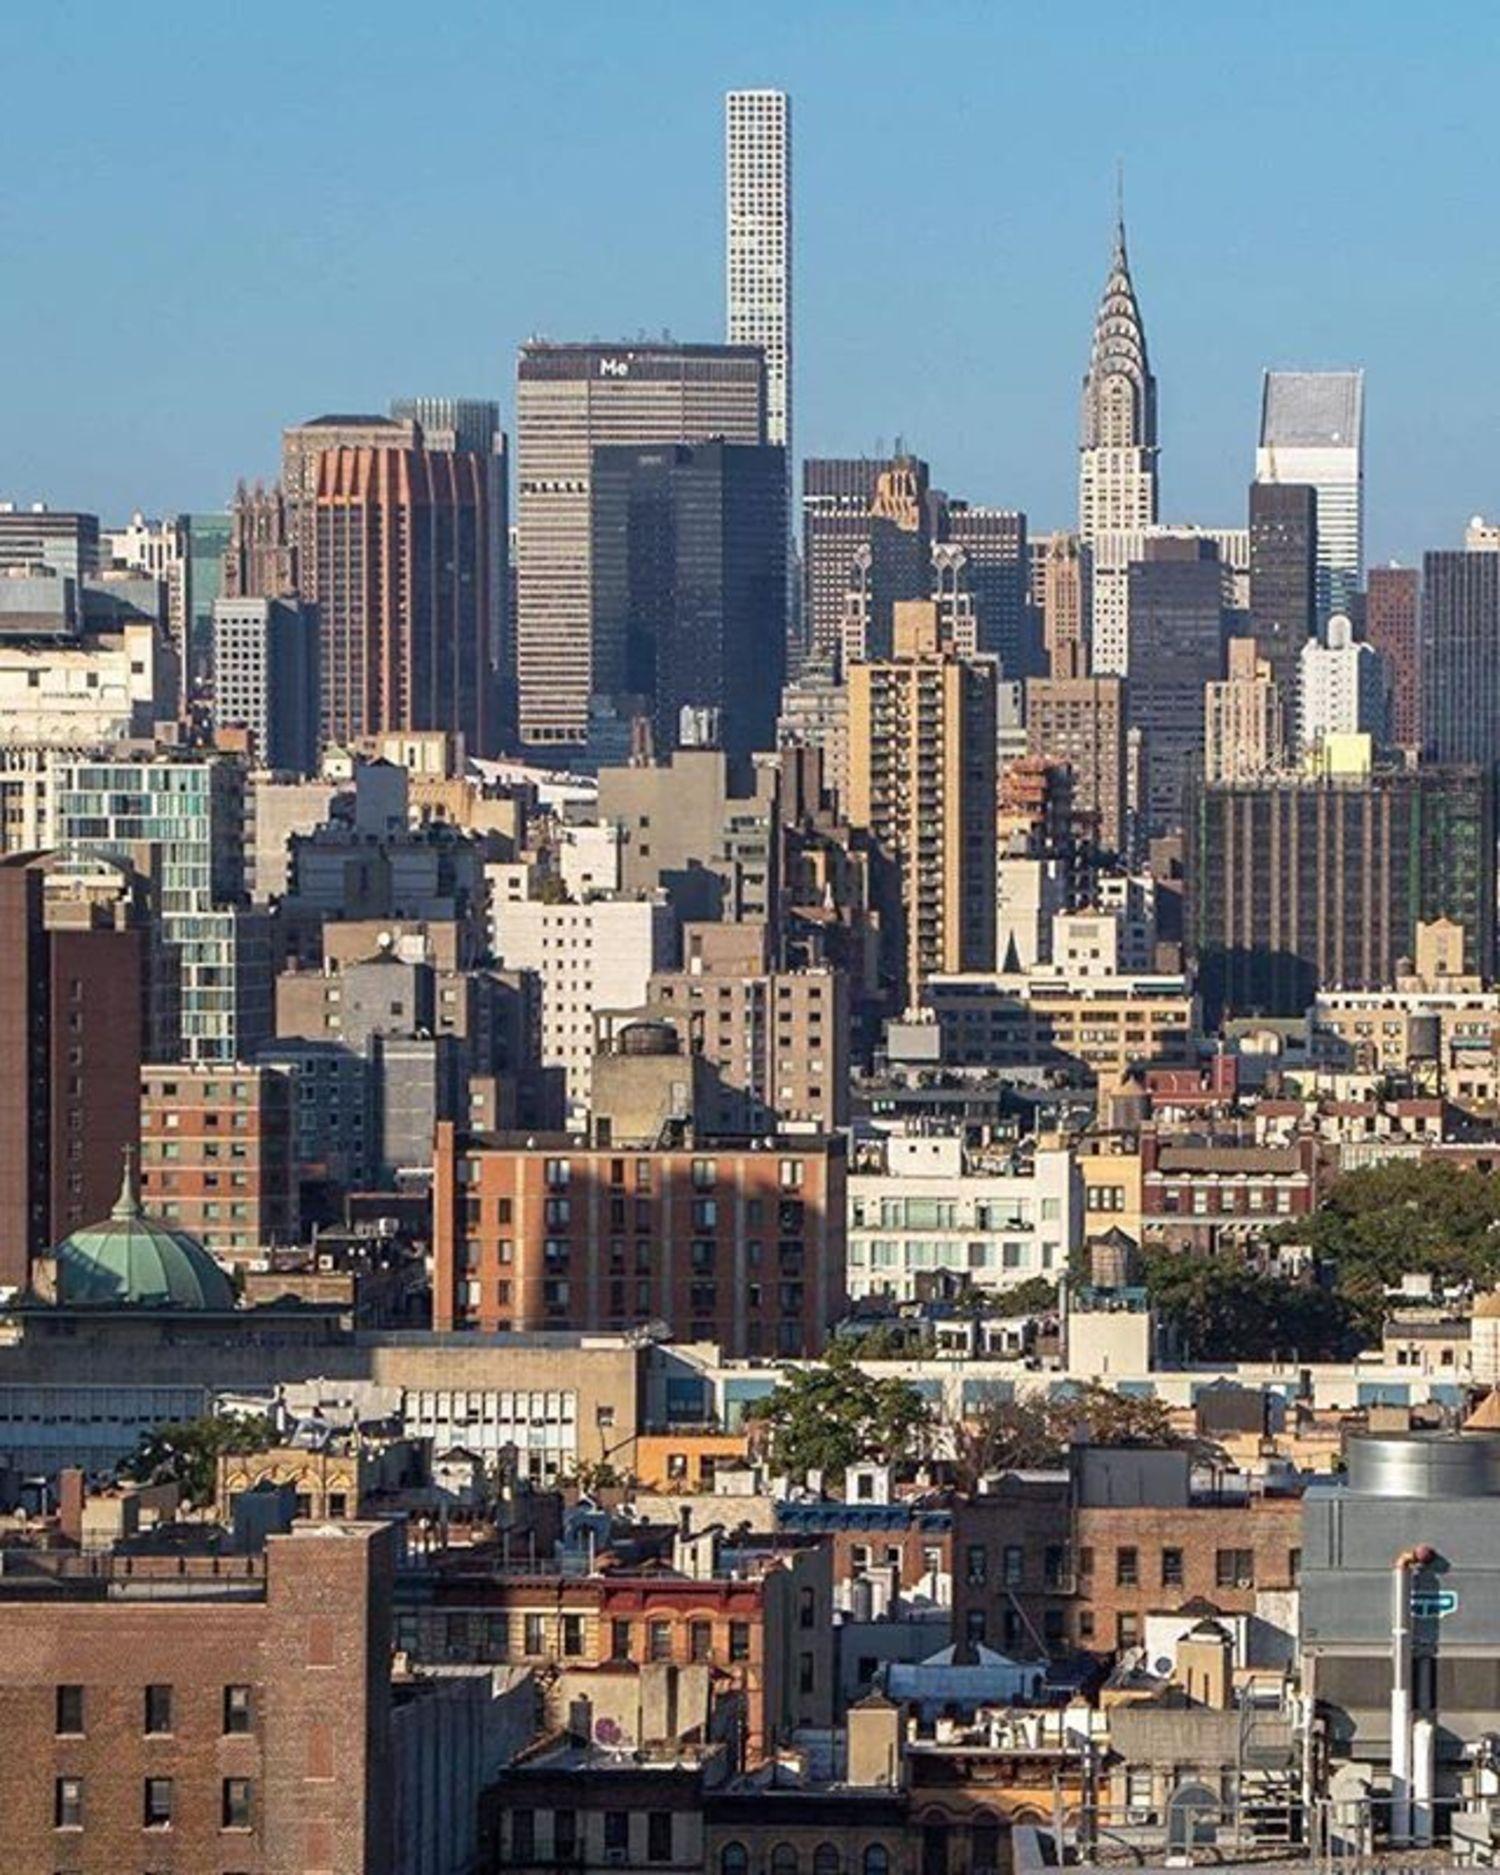 New York, New York. Photo via @newyorkcitykopp #viewingnyc #newyorkcity #newyork #nyc